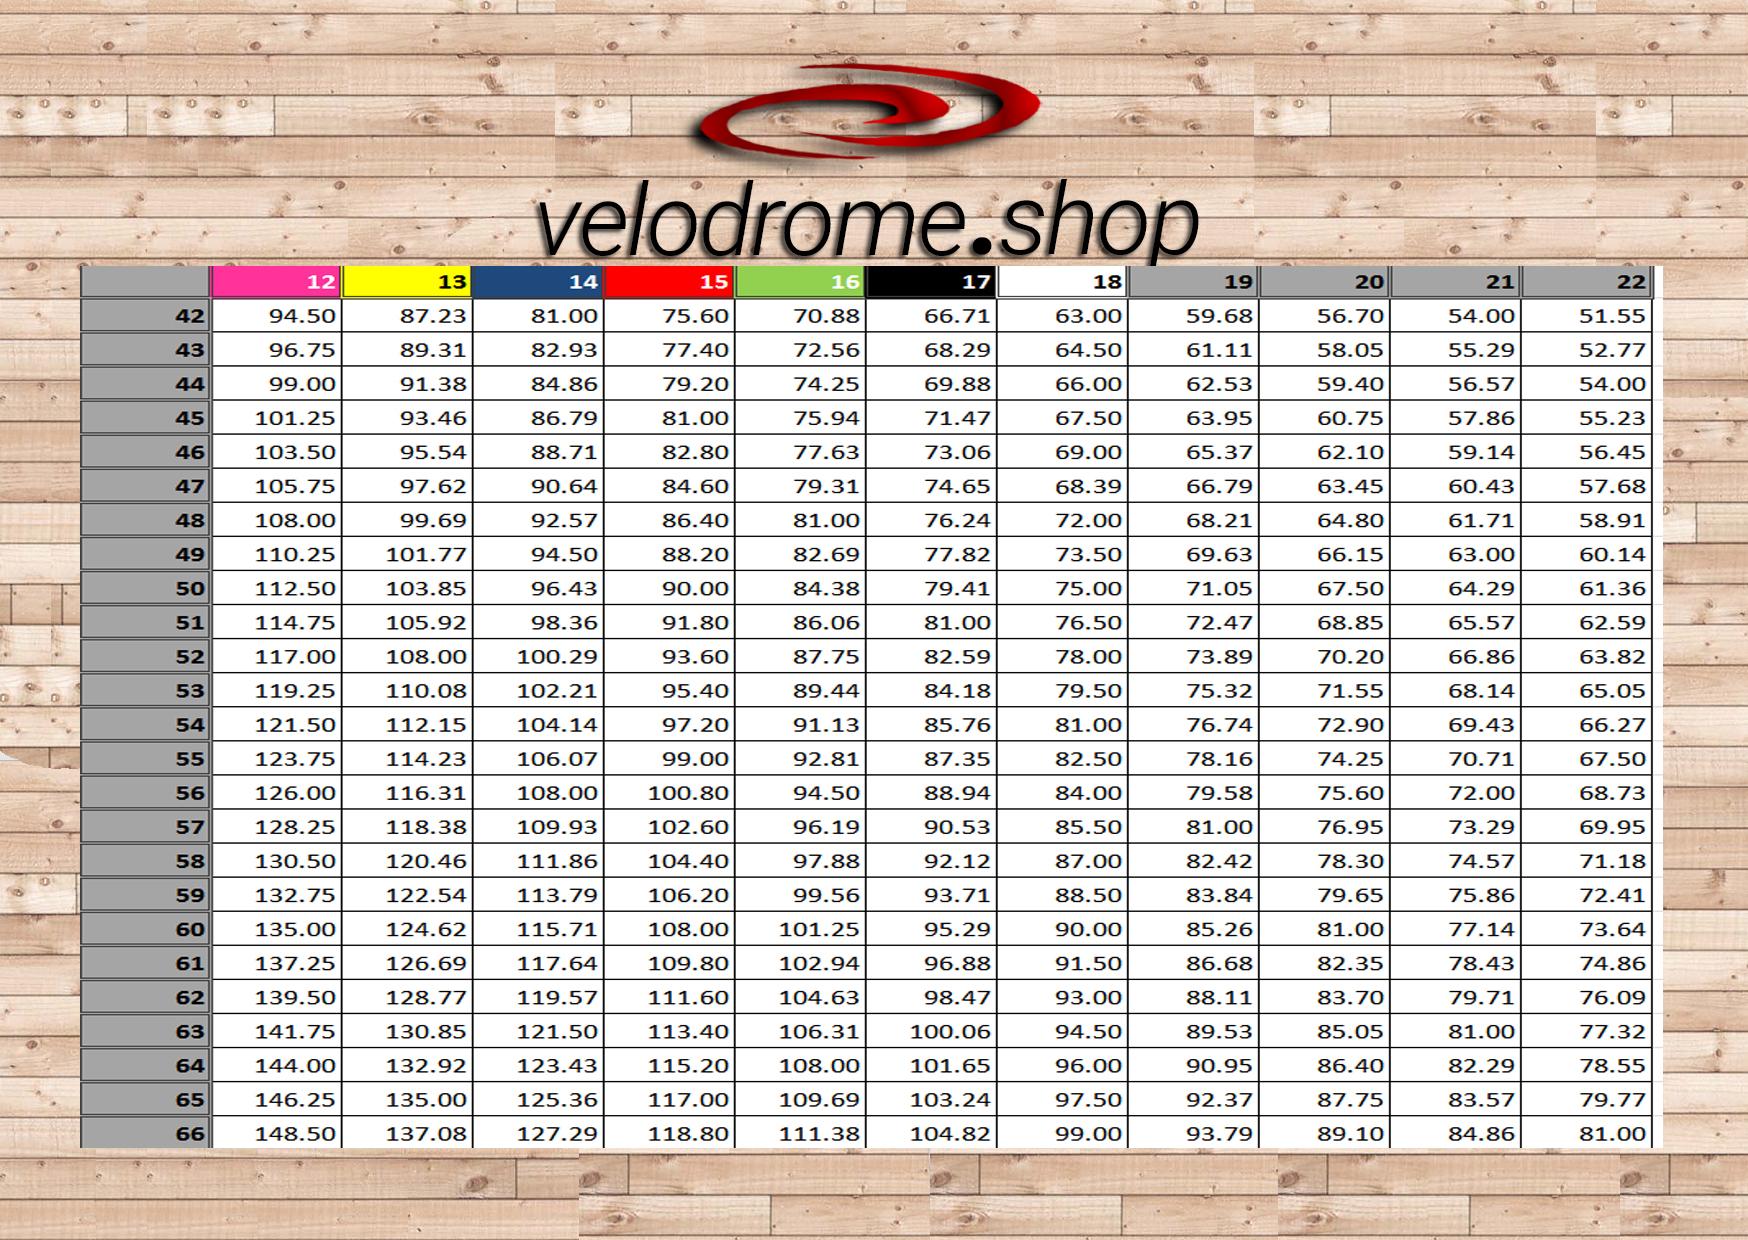 Velodrome Shop Track Cycling Gear Chart